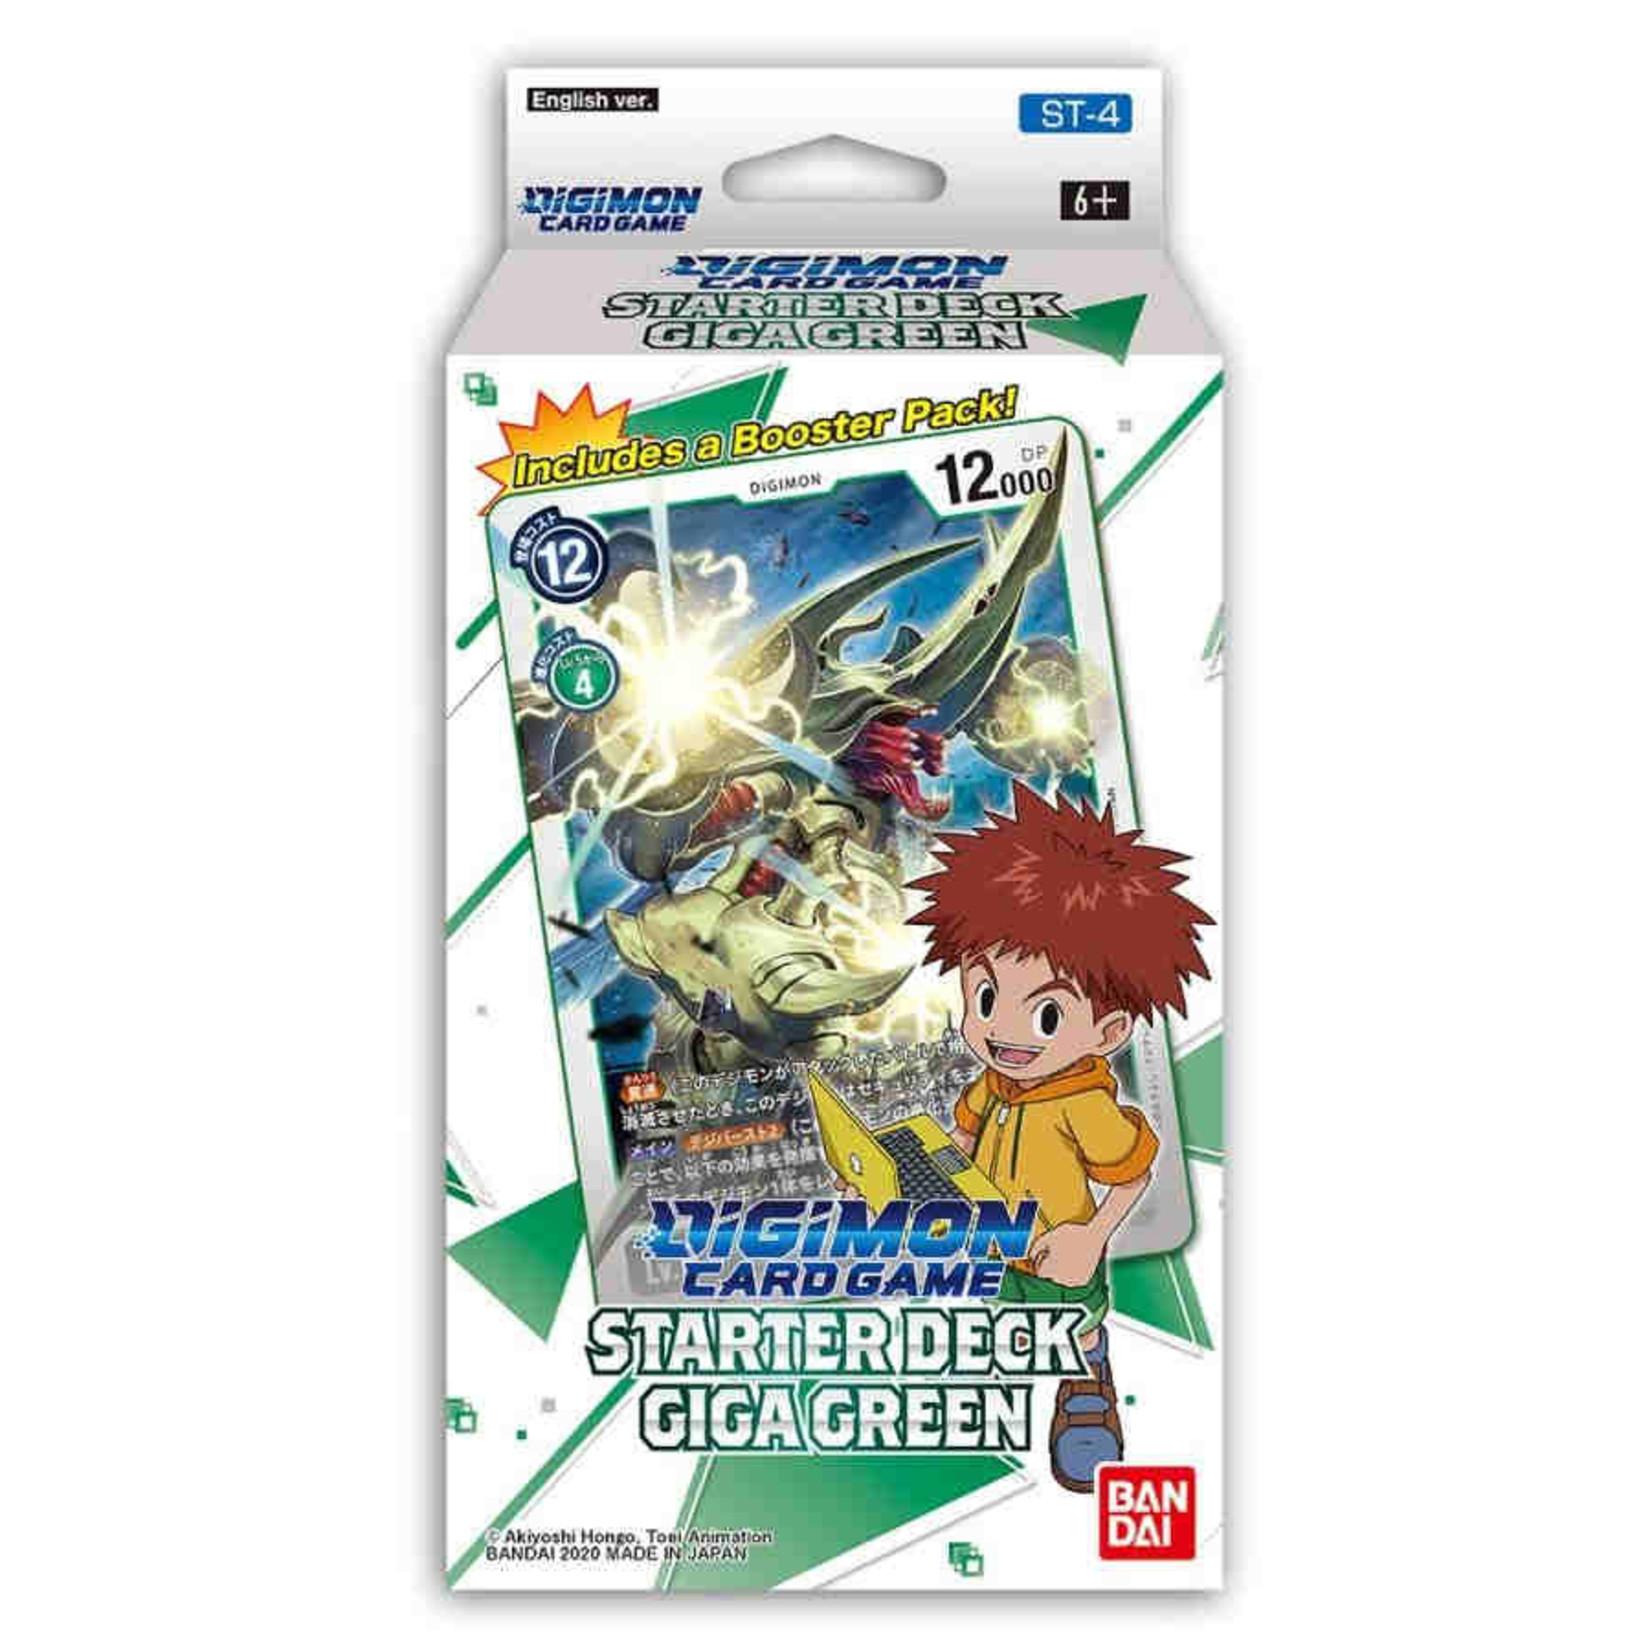 Bandai America, Inc. Digimon TCG Starter Deck Wave 2